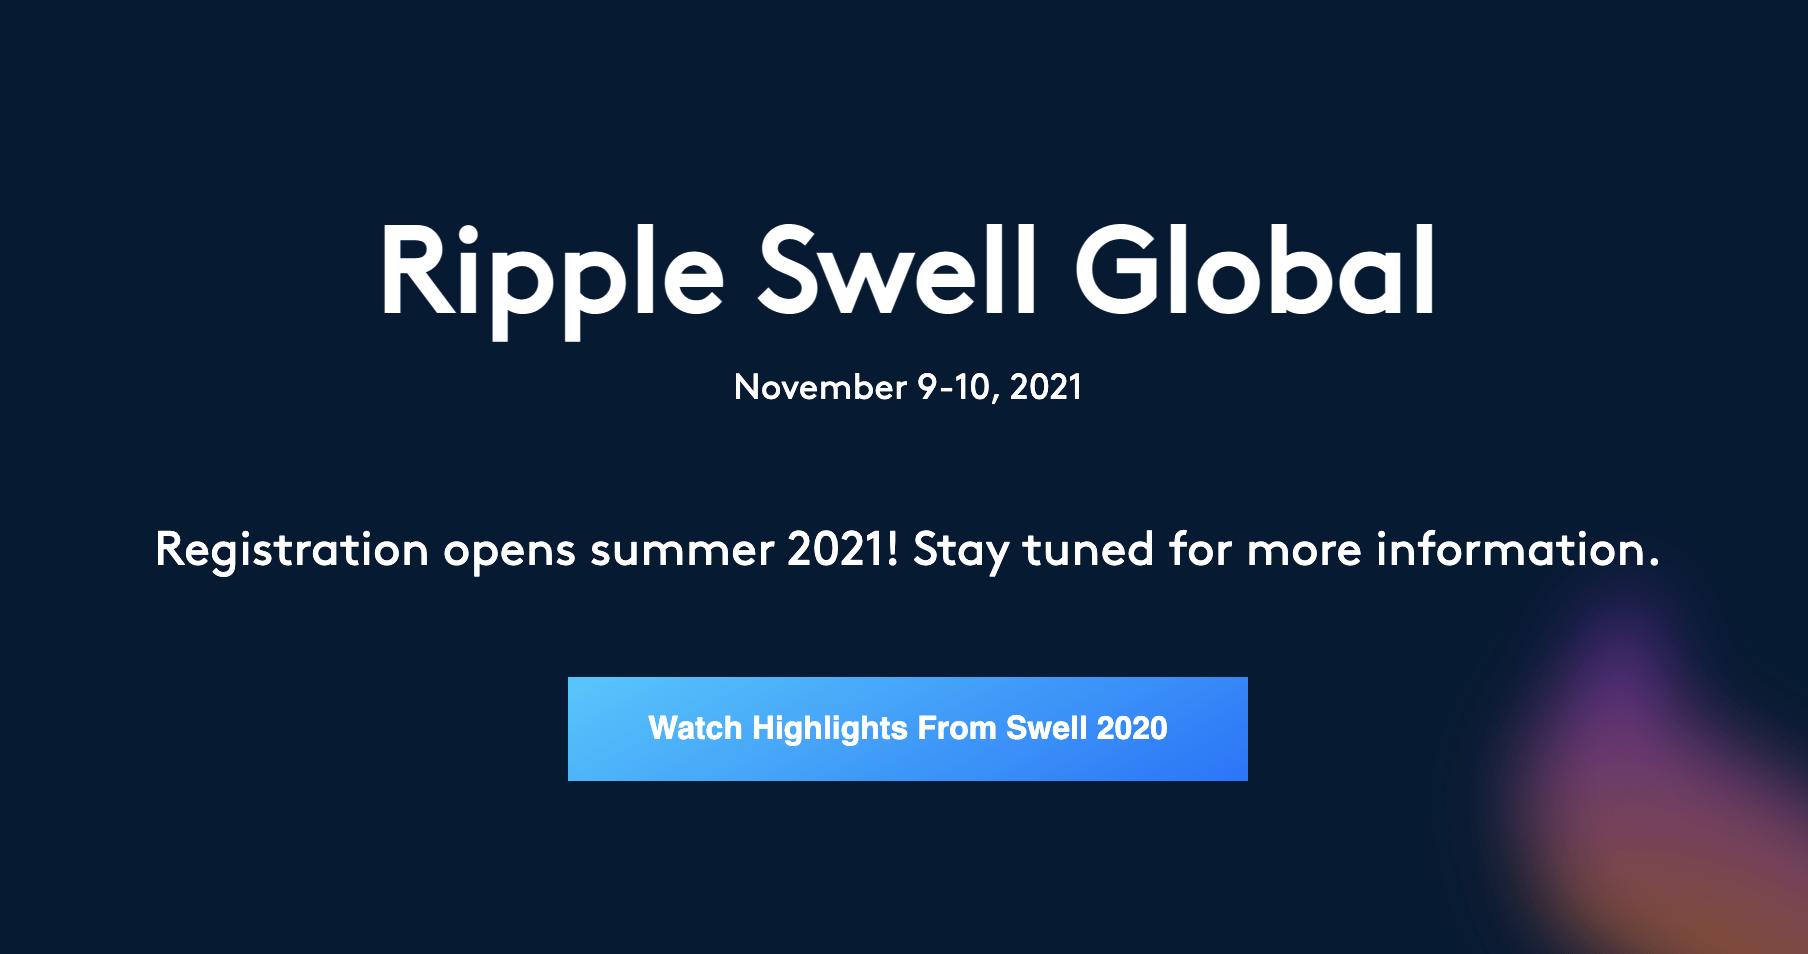 Swell Grobal 2021